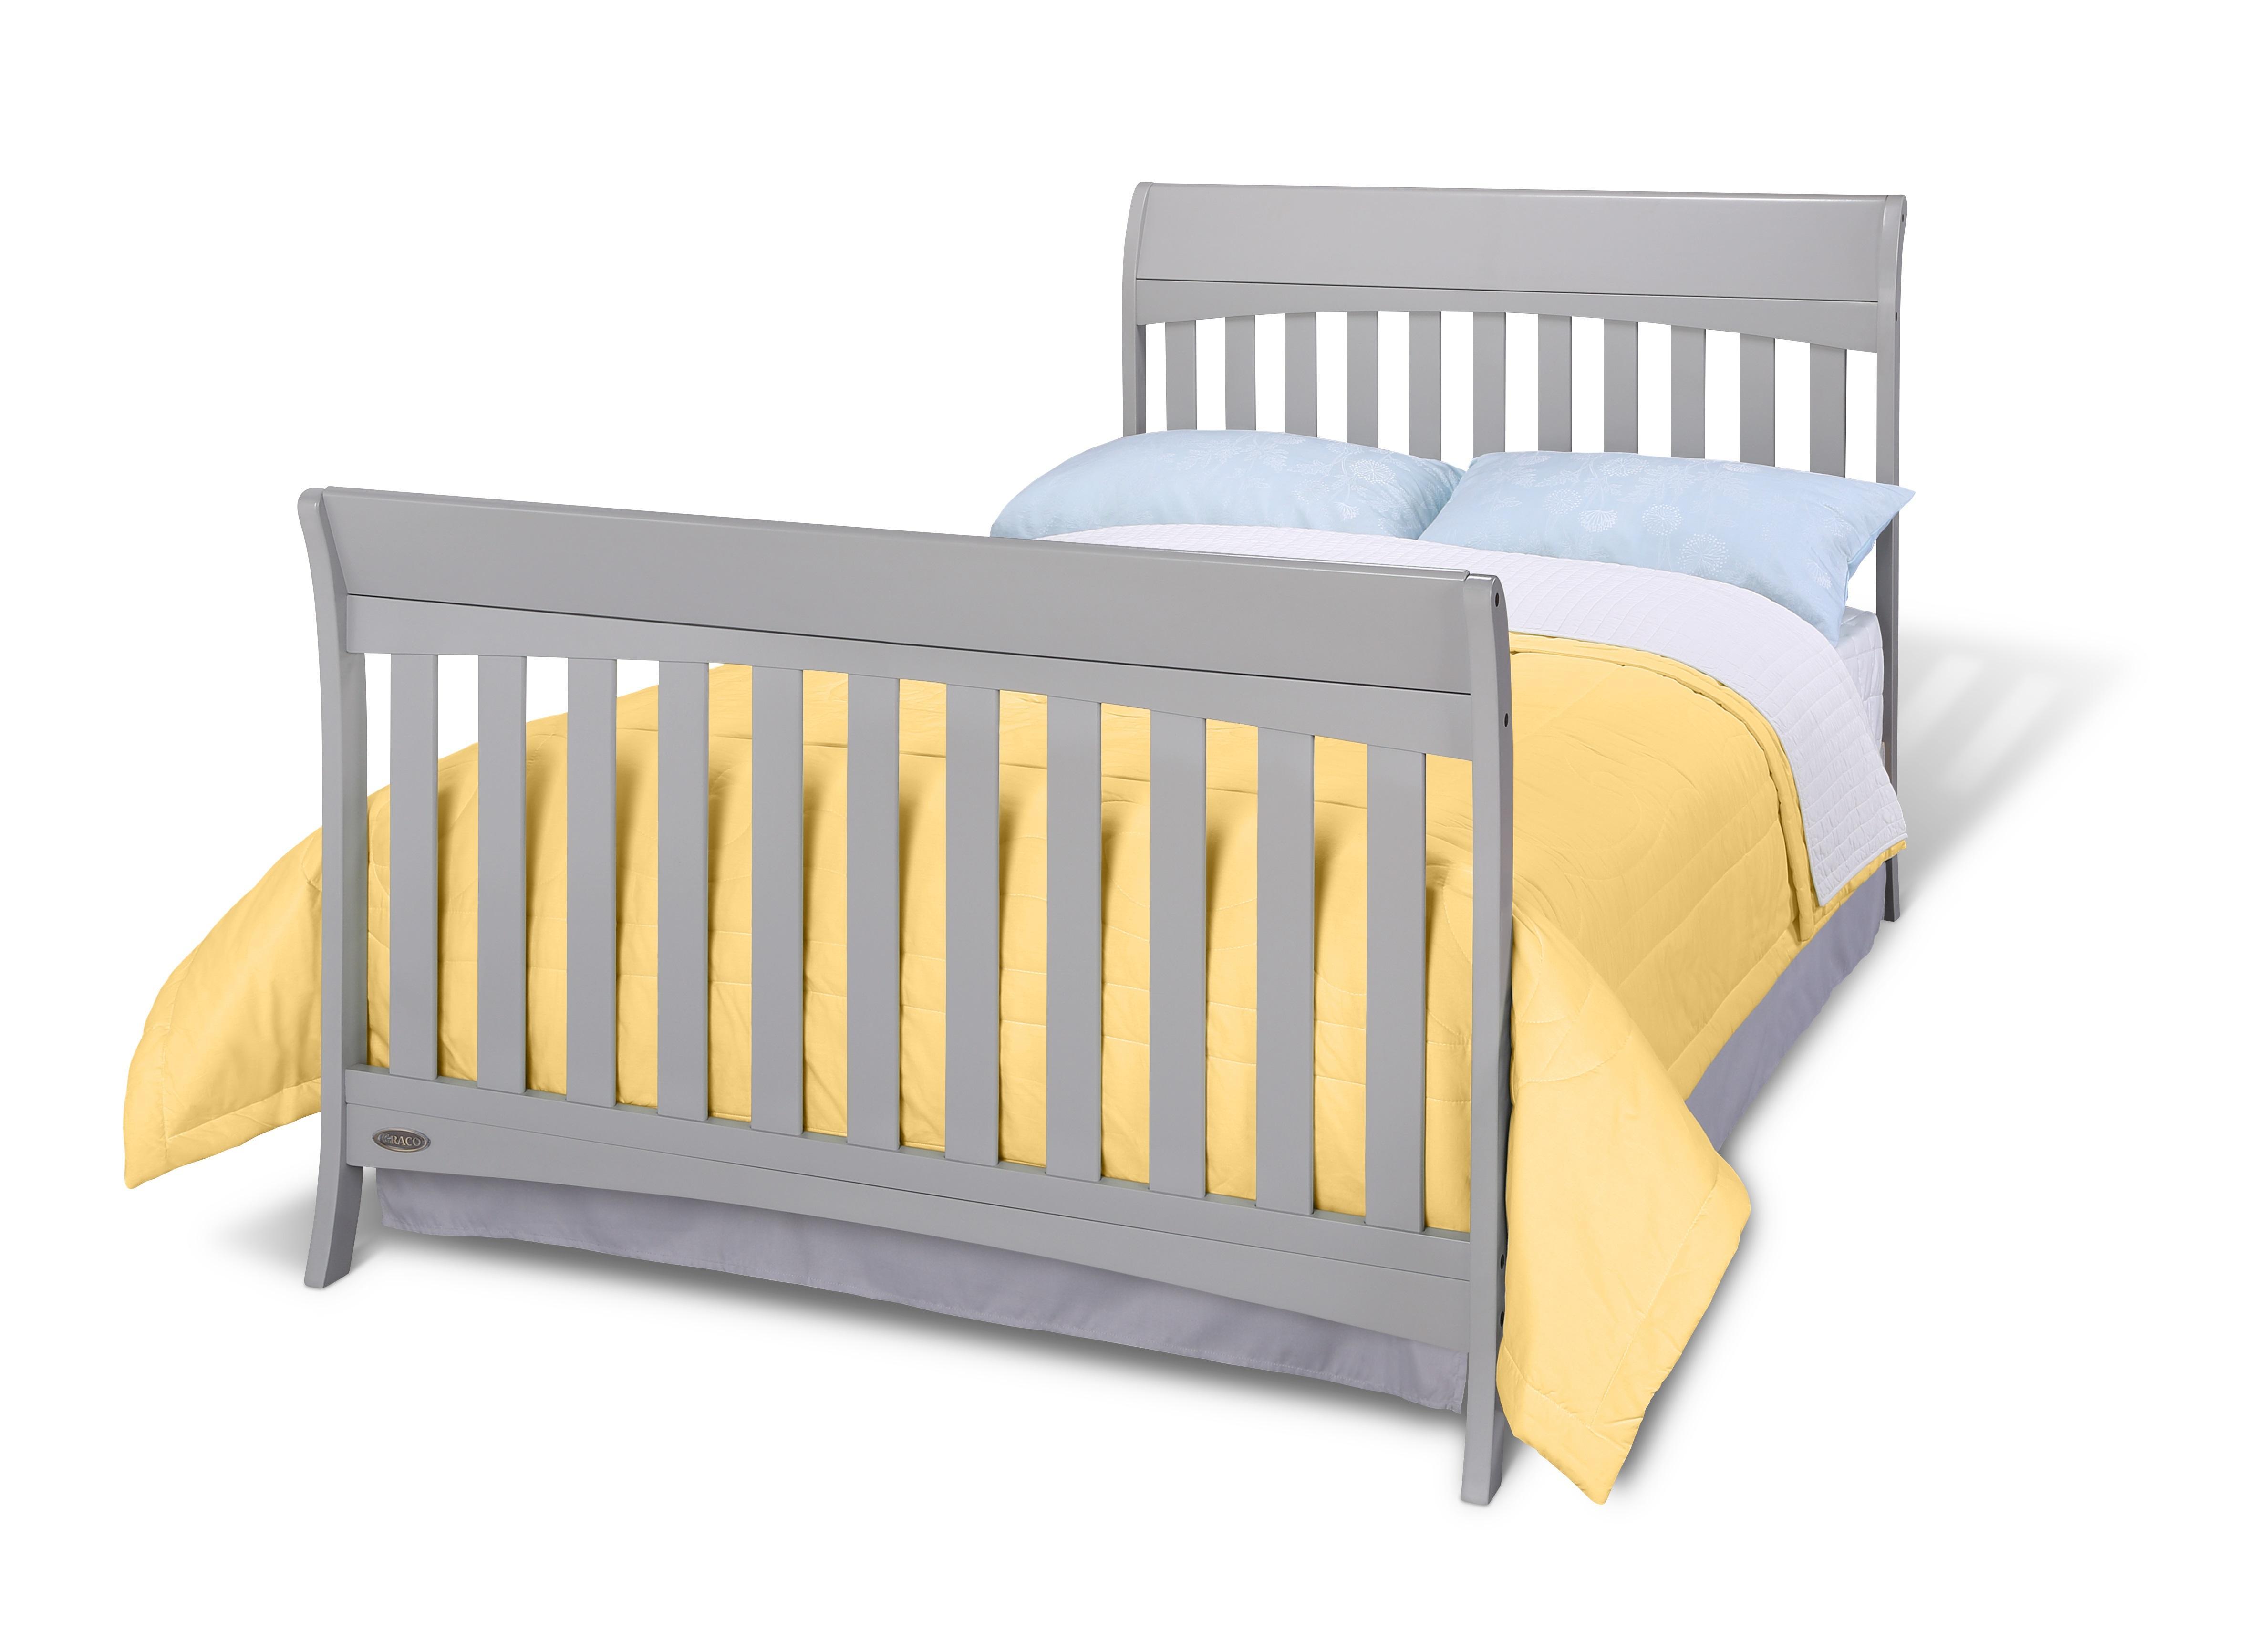 Graco Rory 4 In 1 Convertible Crib Pebble Gray Amazon Ca